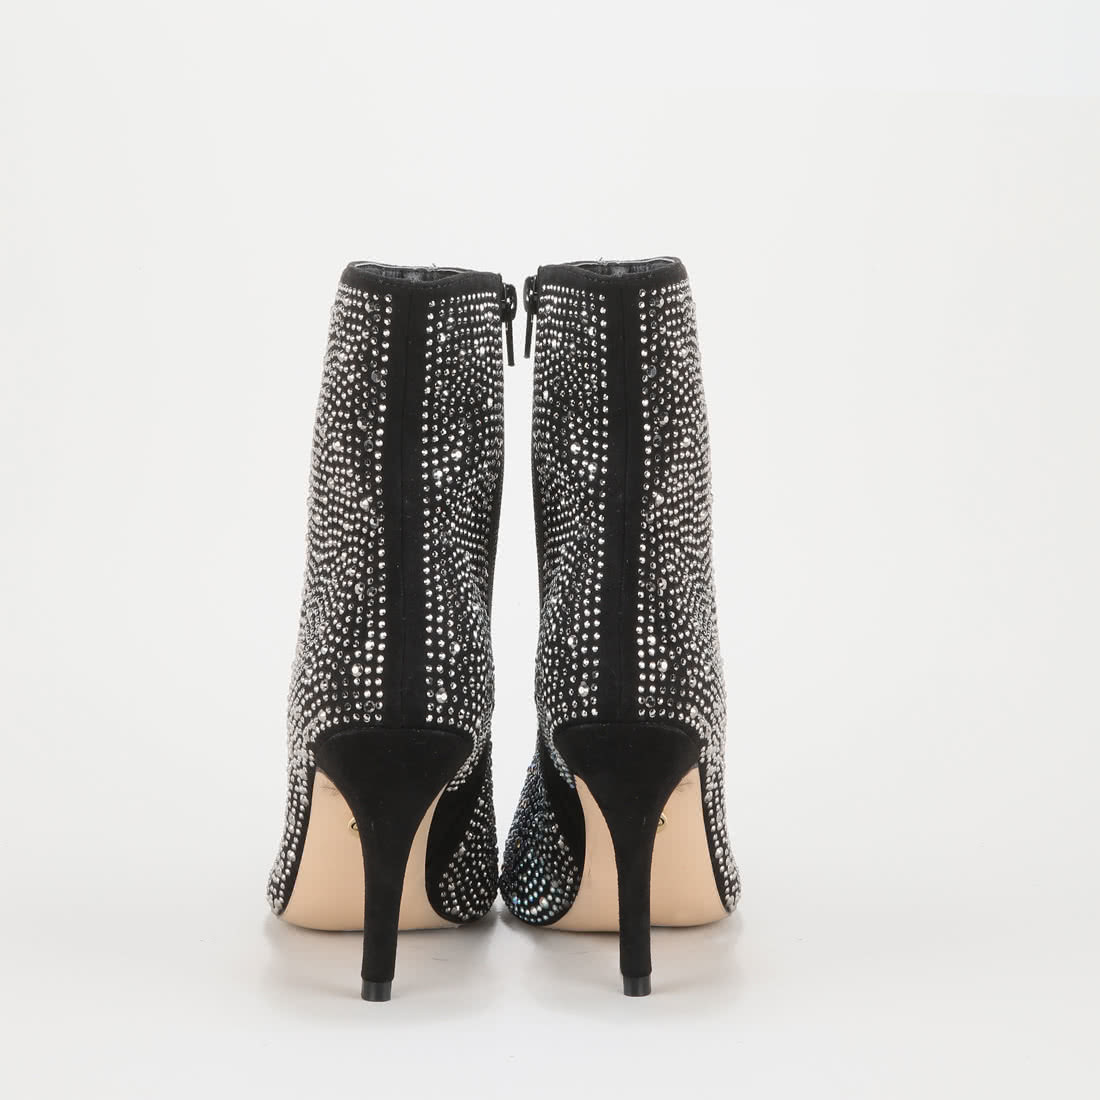 reputable site c05fb 61cb0 Iris Ankle Boot Suede/Glitzer schwarz online kaufen | BUFFALO®